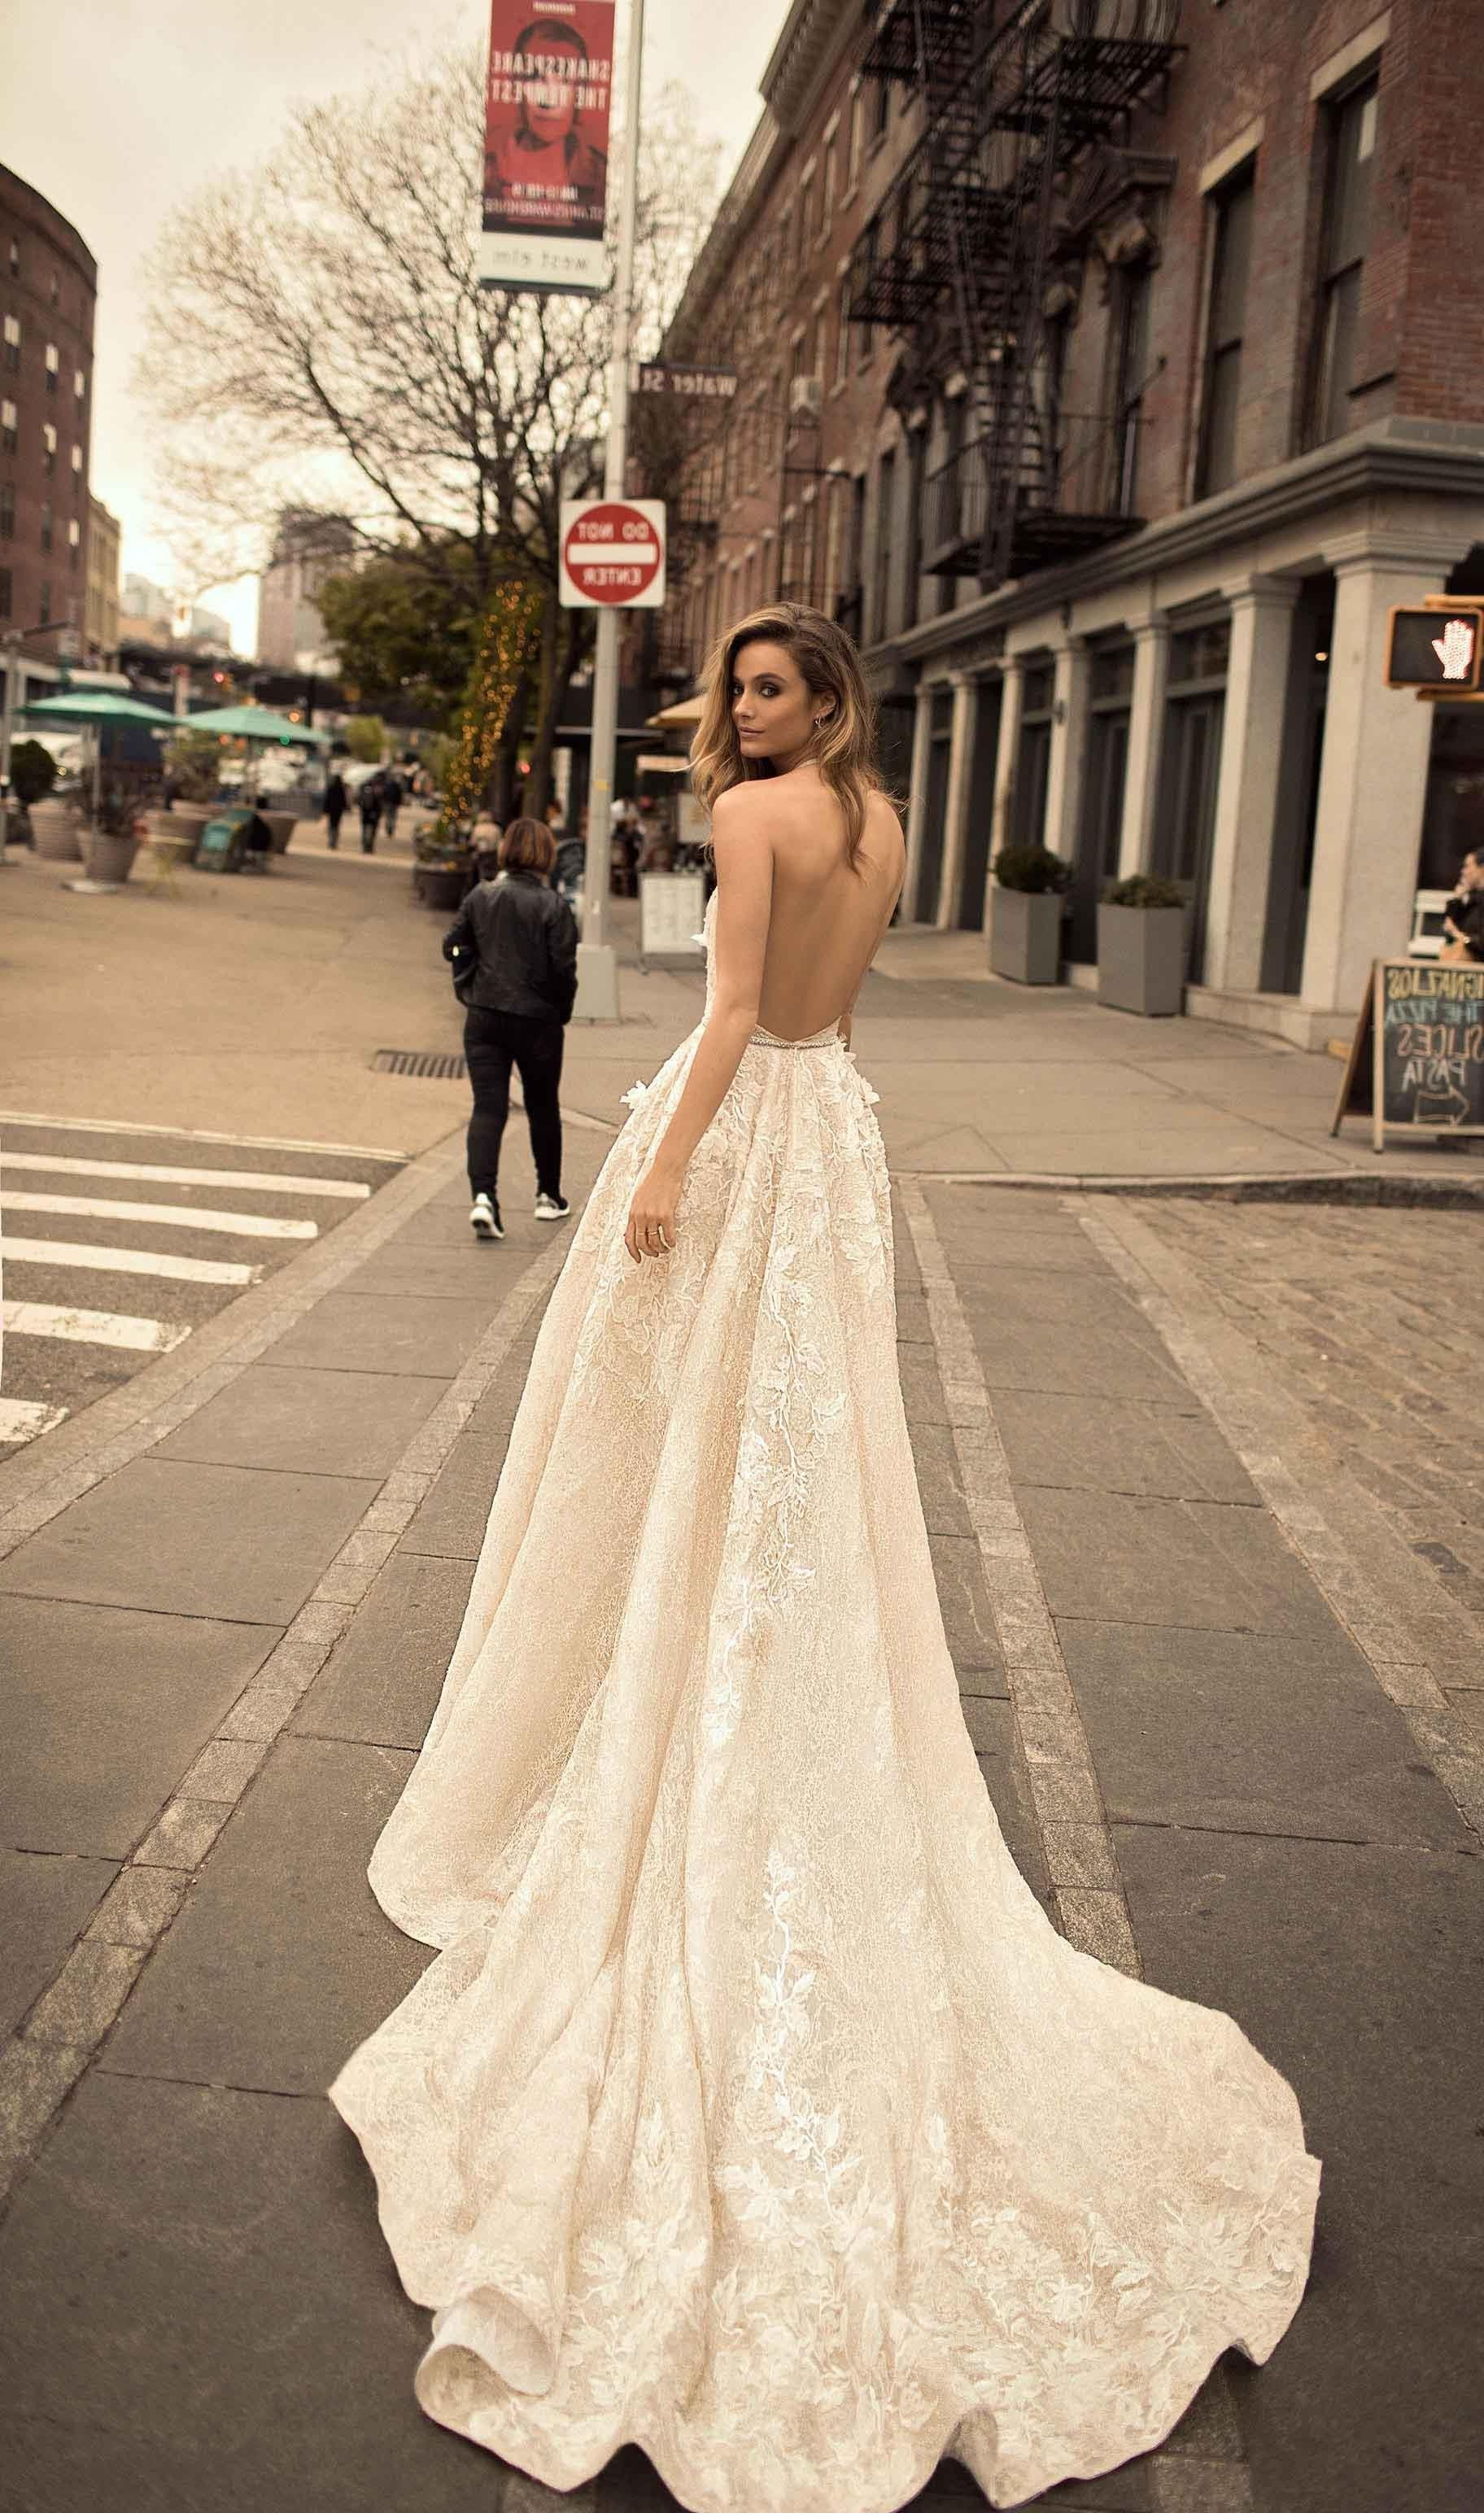 Design Bridesmaid Hijab Dress Ipdd Wedding Ideas White and Gold Wedding Dress the Newest